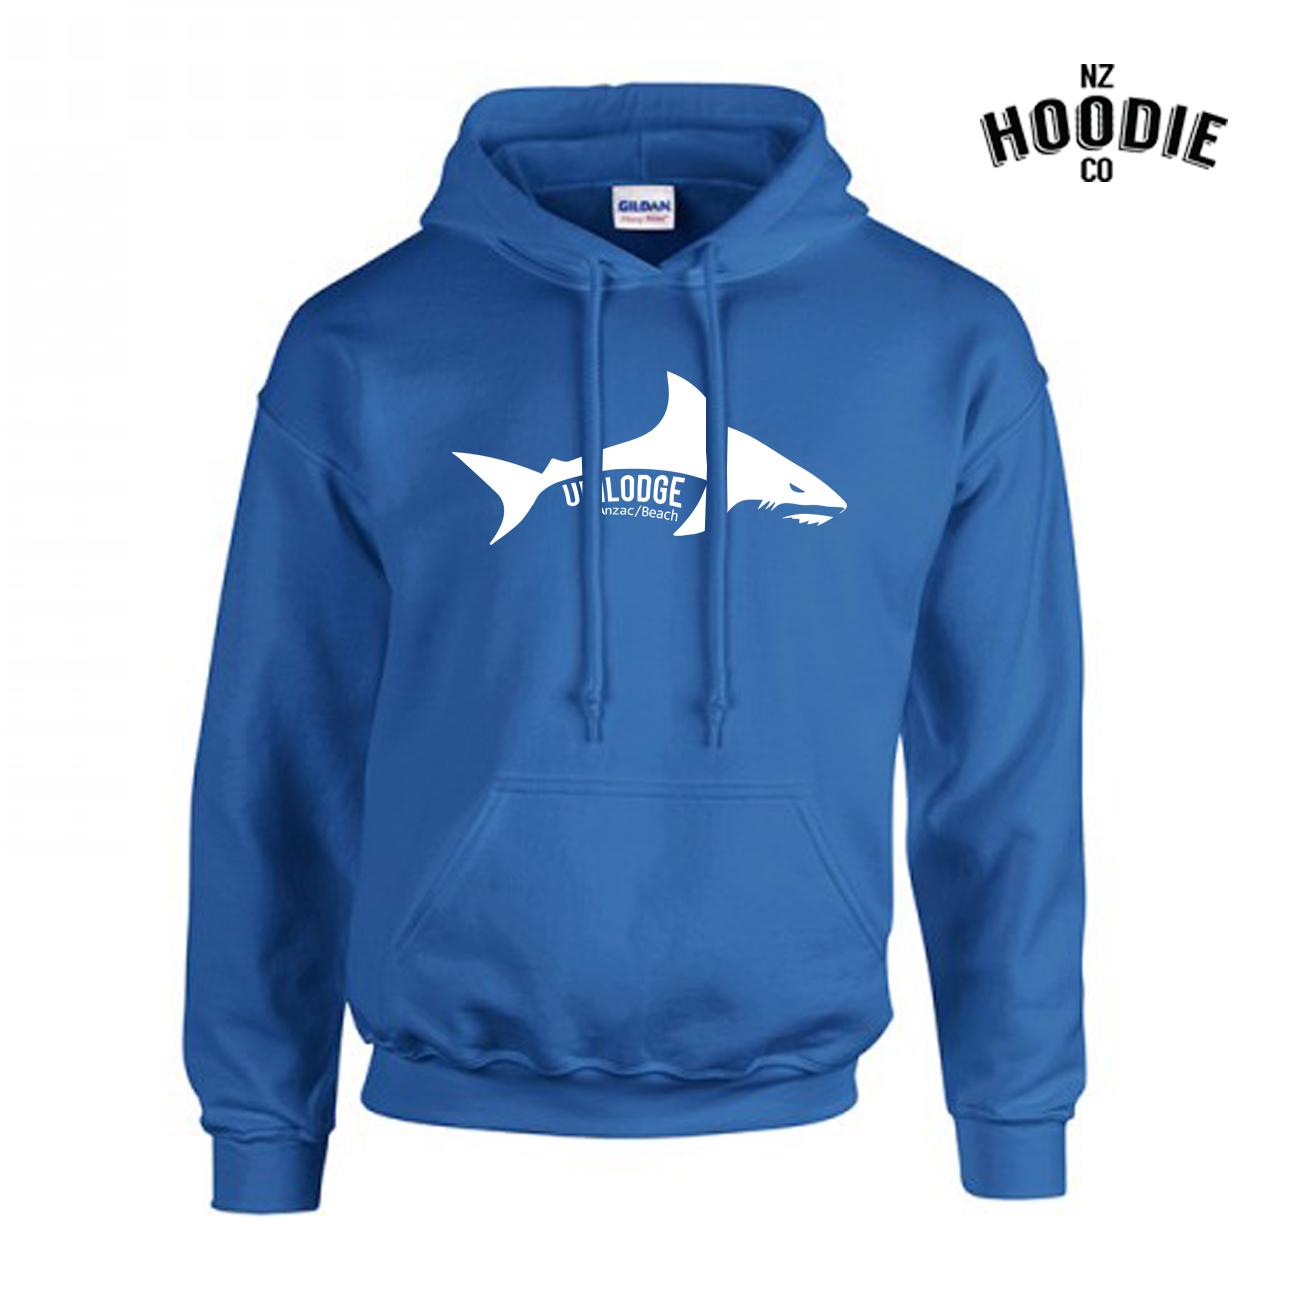 UniLodge Anzac Beach SHARK Gilden Hoodie FRONT.jpg